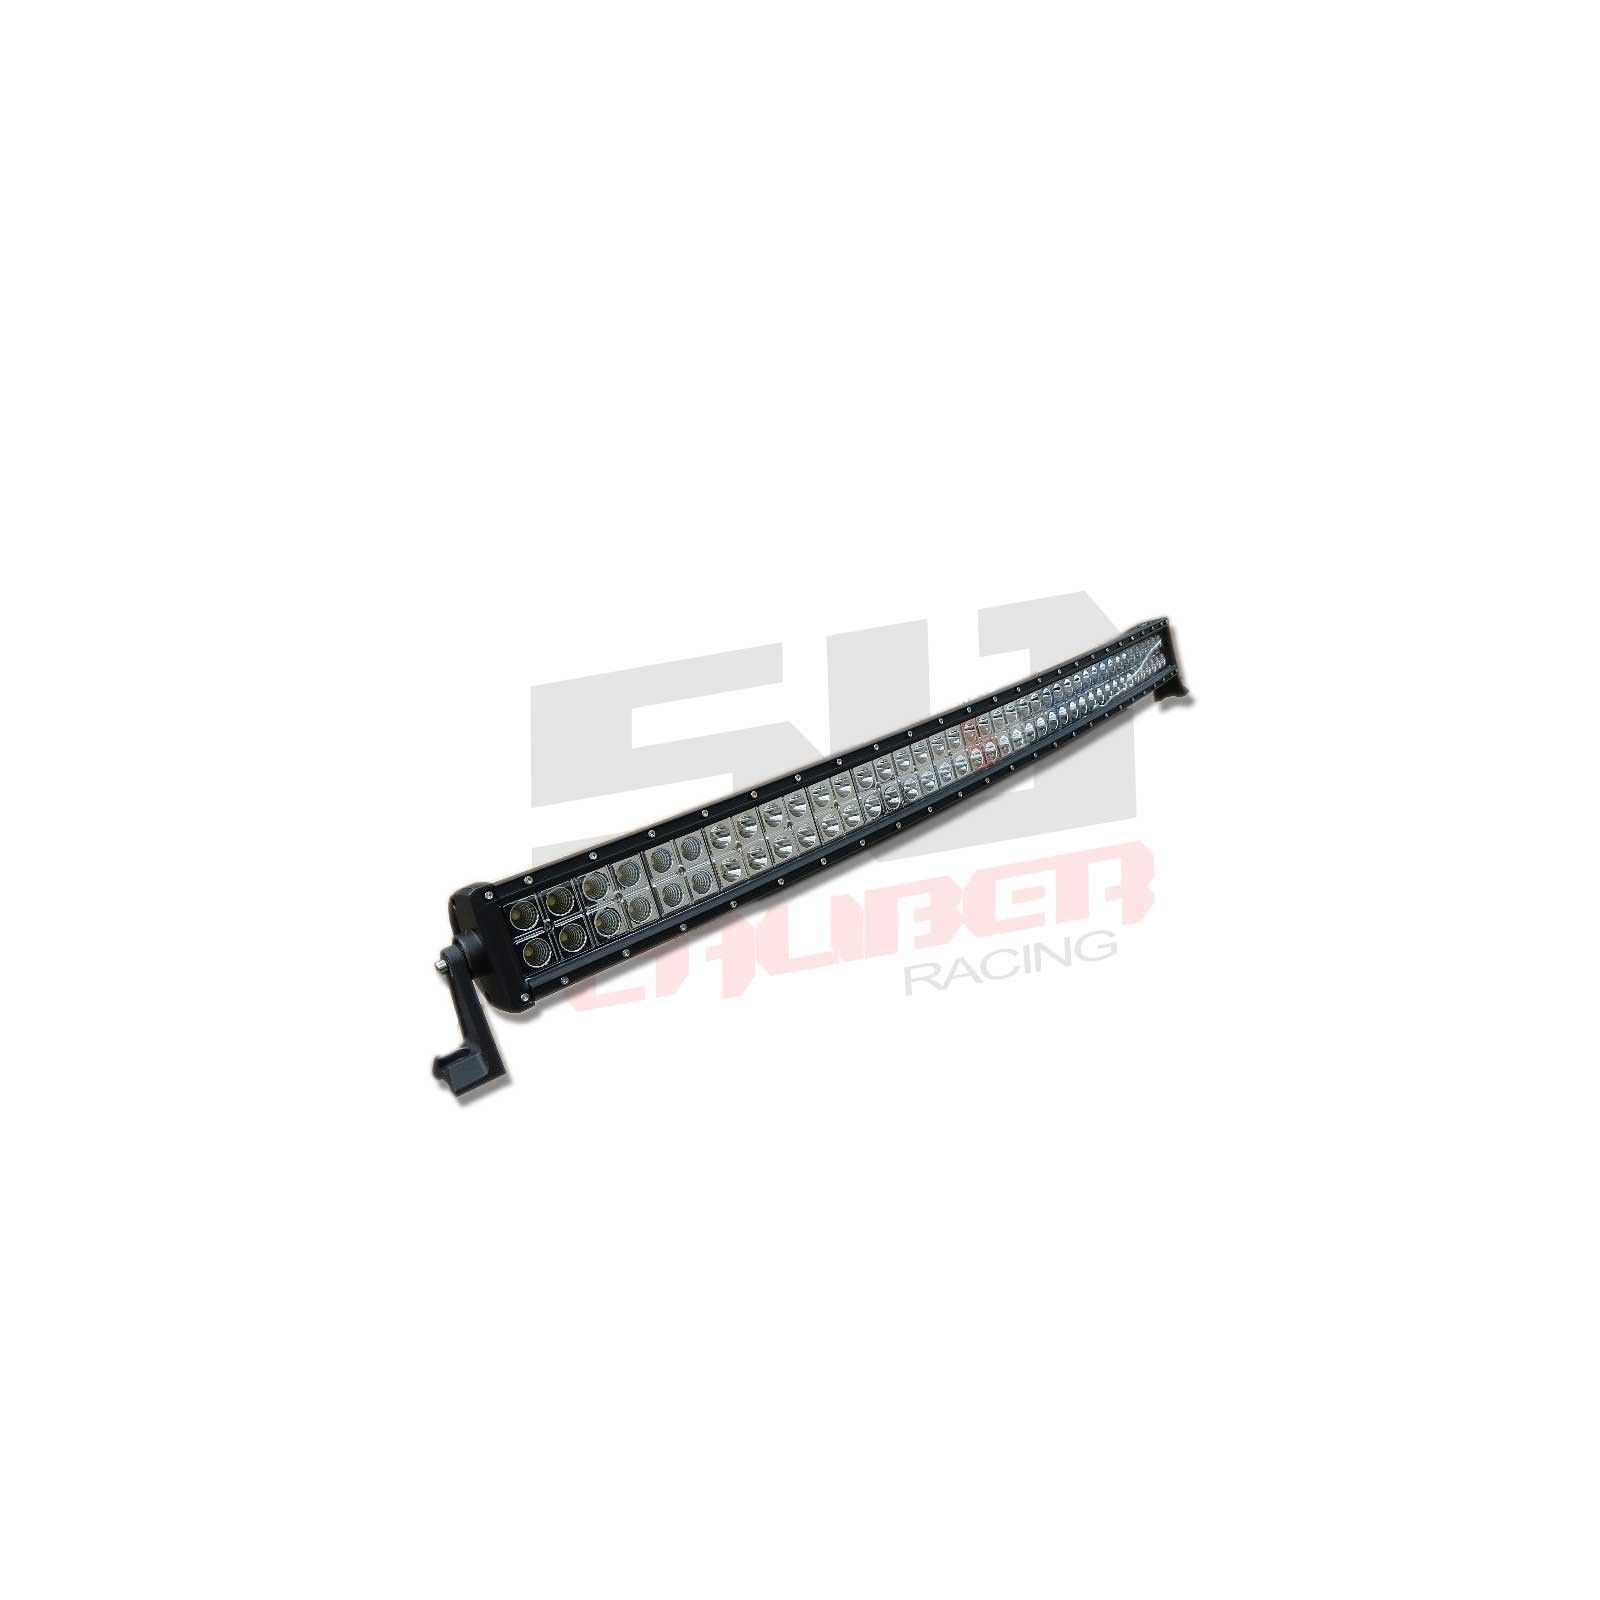 40 Inch Curved Led Light Bar